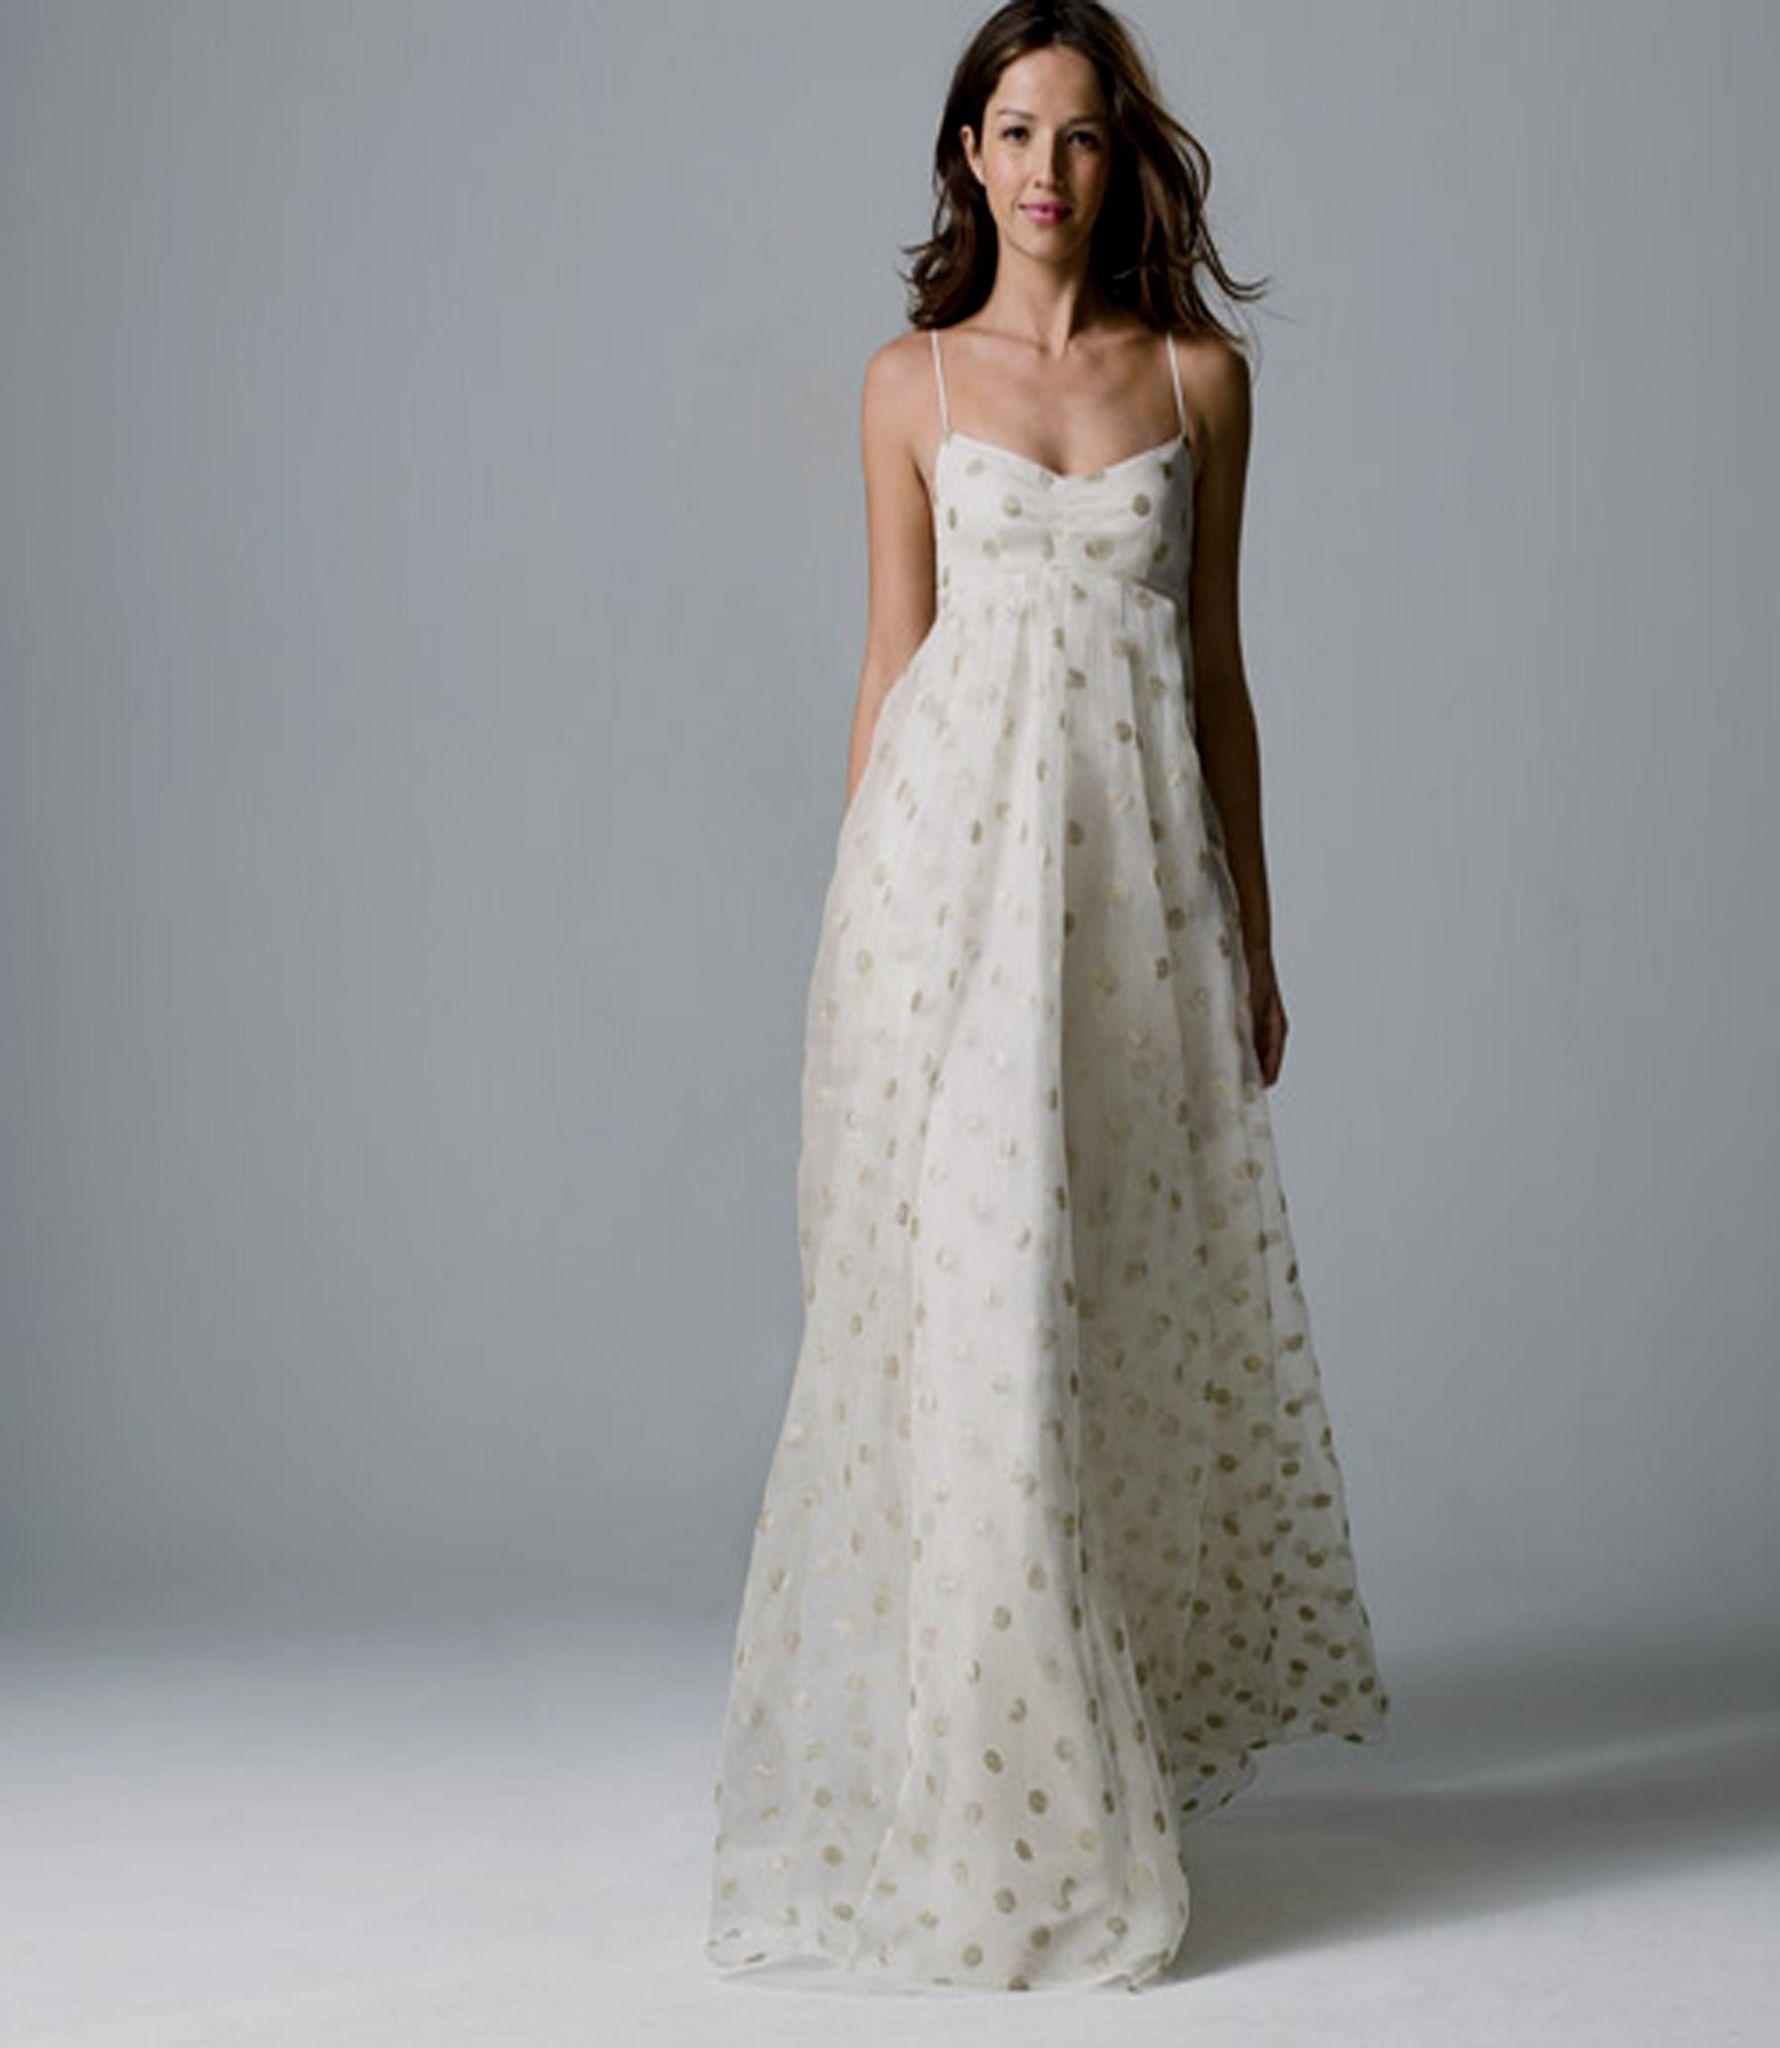 Casual Wedding Dresses for Older Brides - Plus Size Dresses for ...